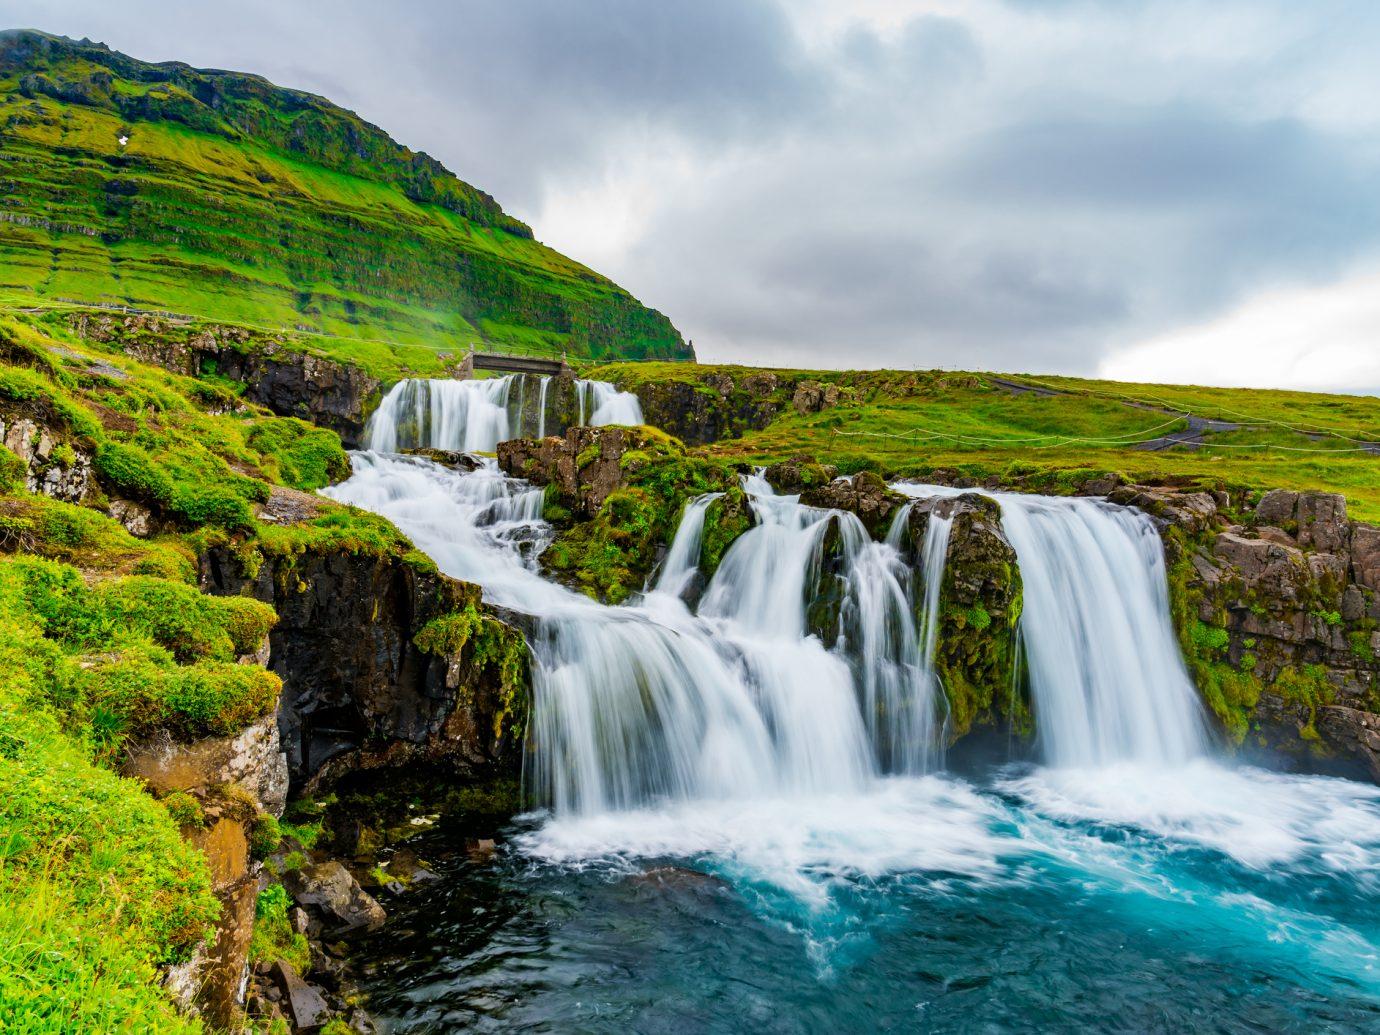 View of Kirkjufellsfoss Waterfalls at Kirkjufell Mountain in the summer rainy day at Grundarfjordur in West Iceland